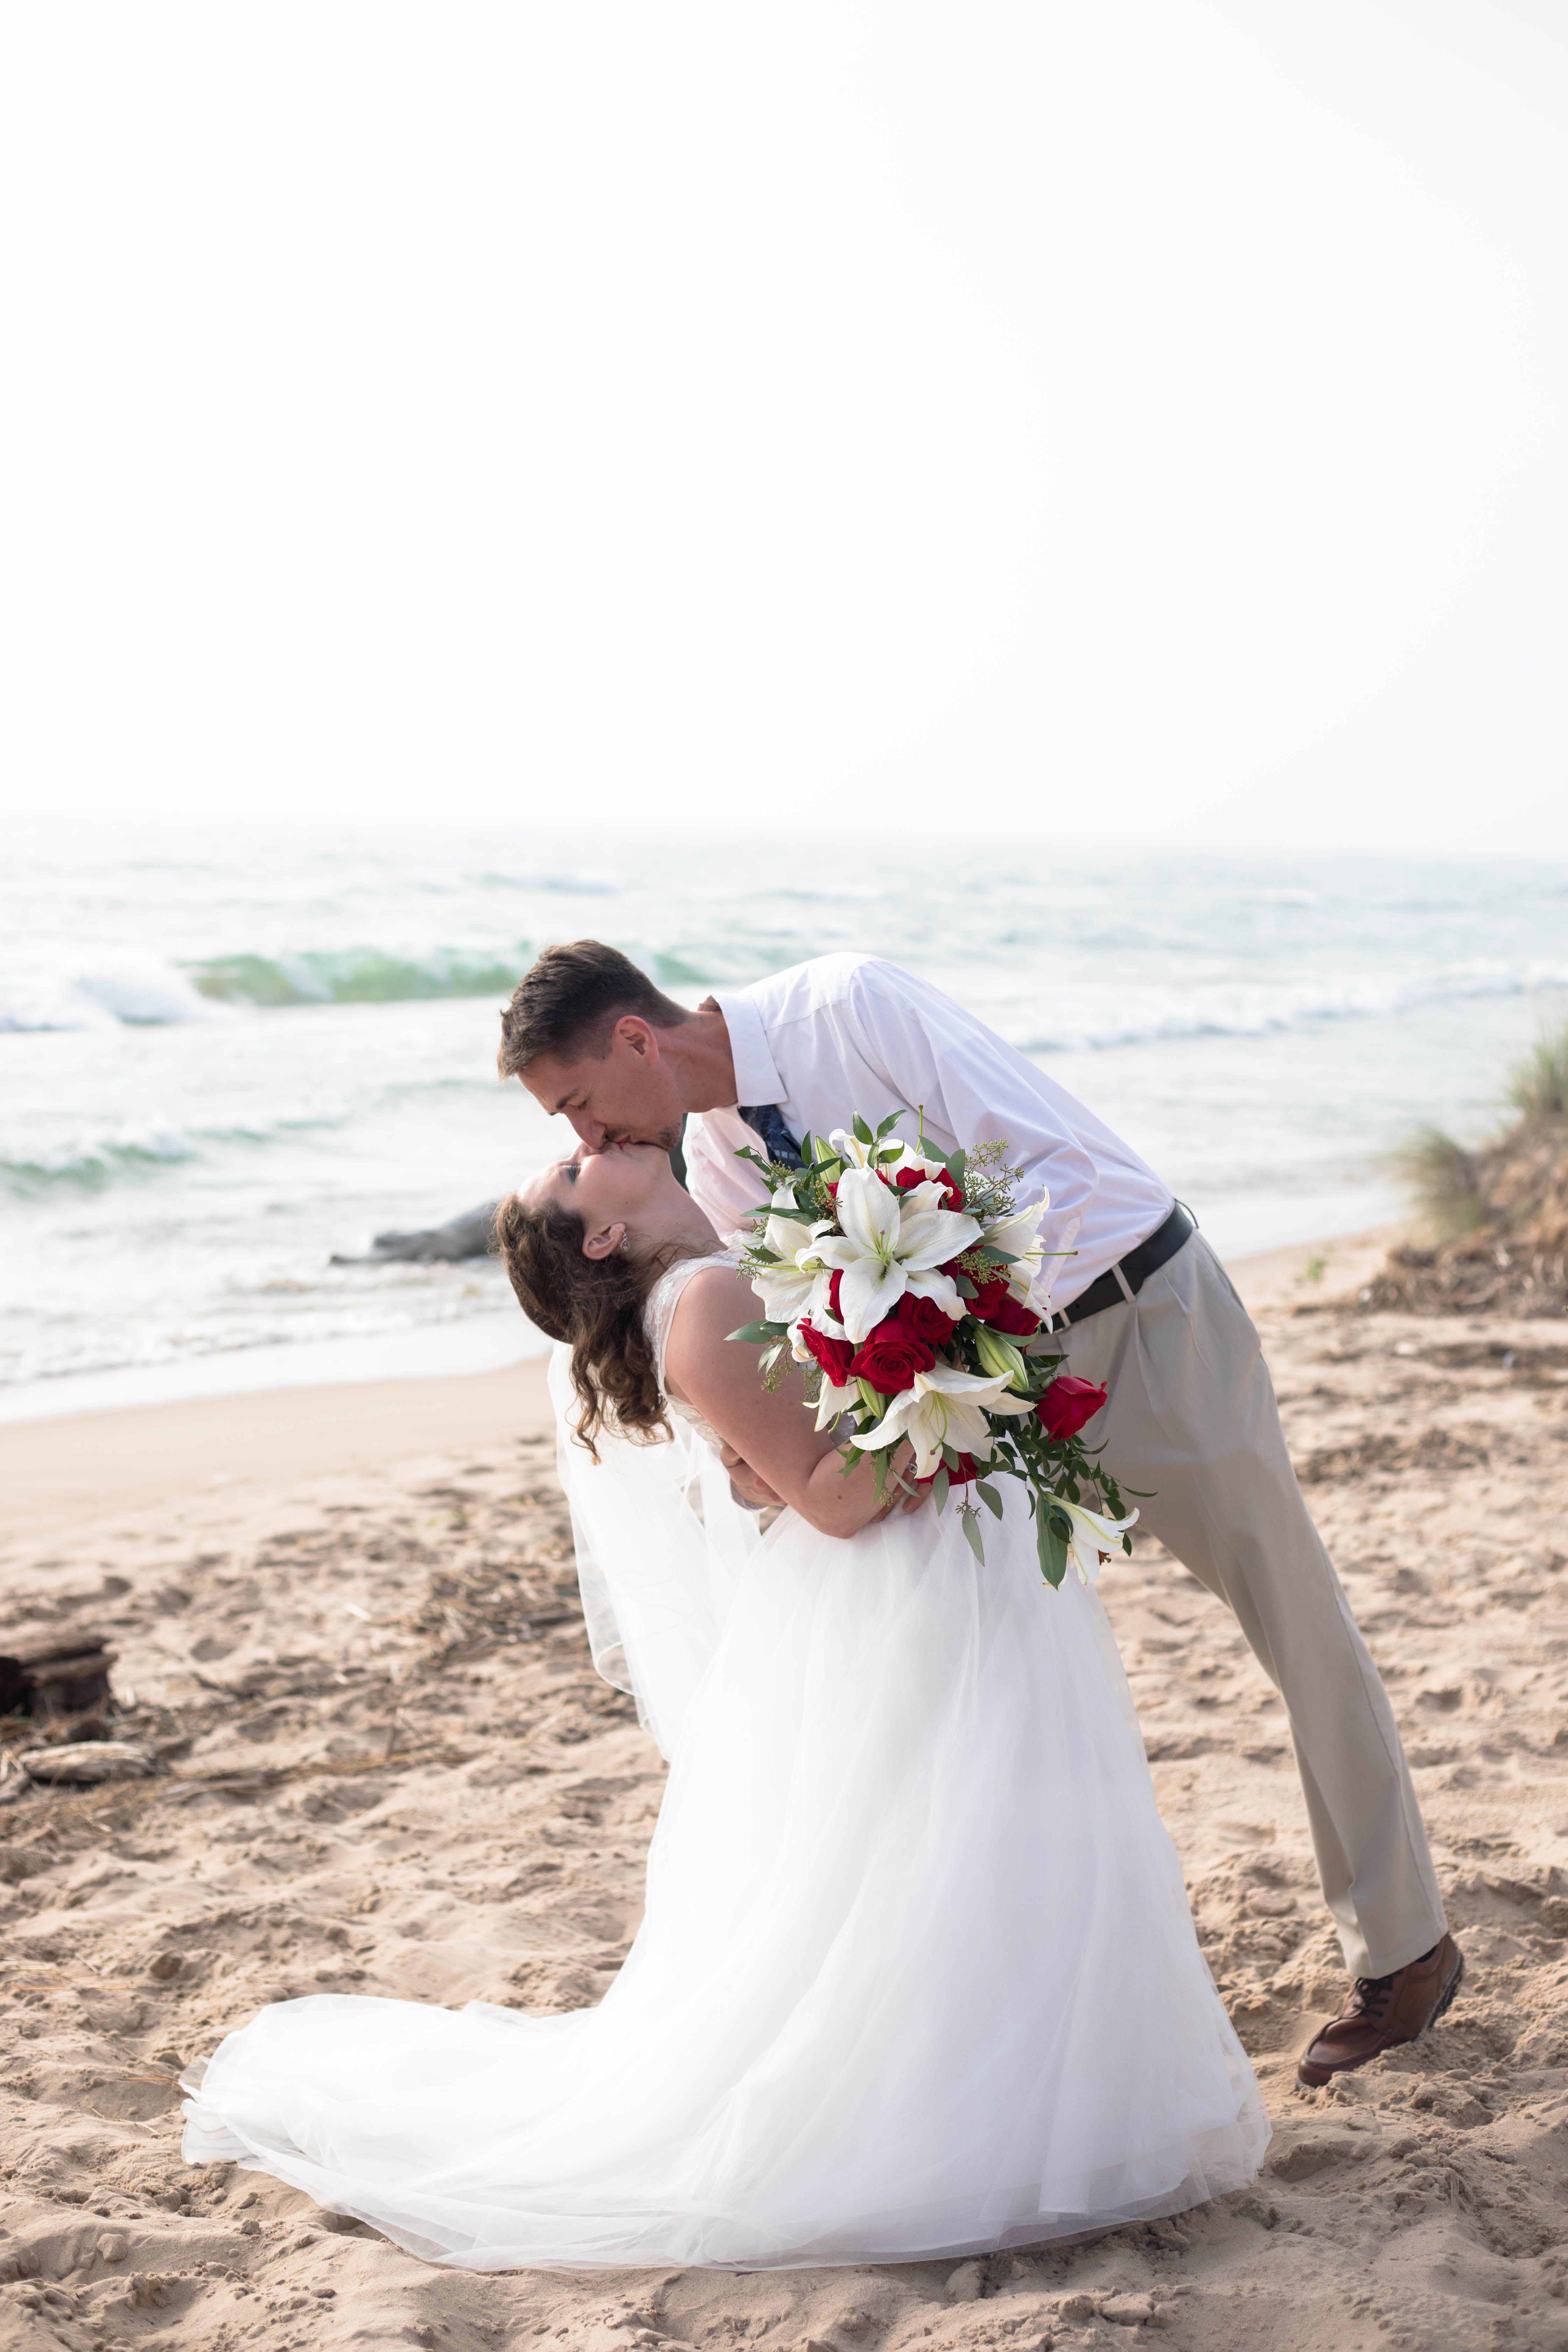 Pin by My Barefoot Wedding on Wedding Photo Ideas